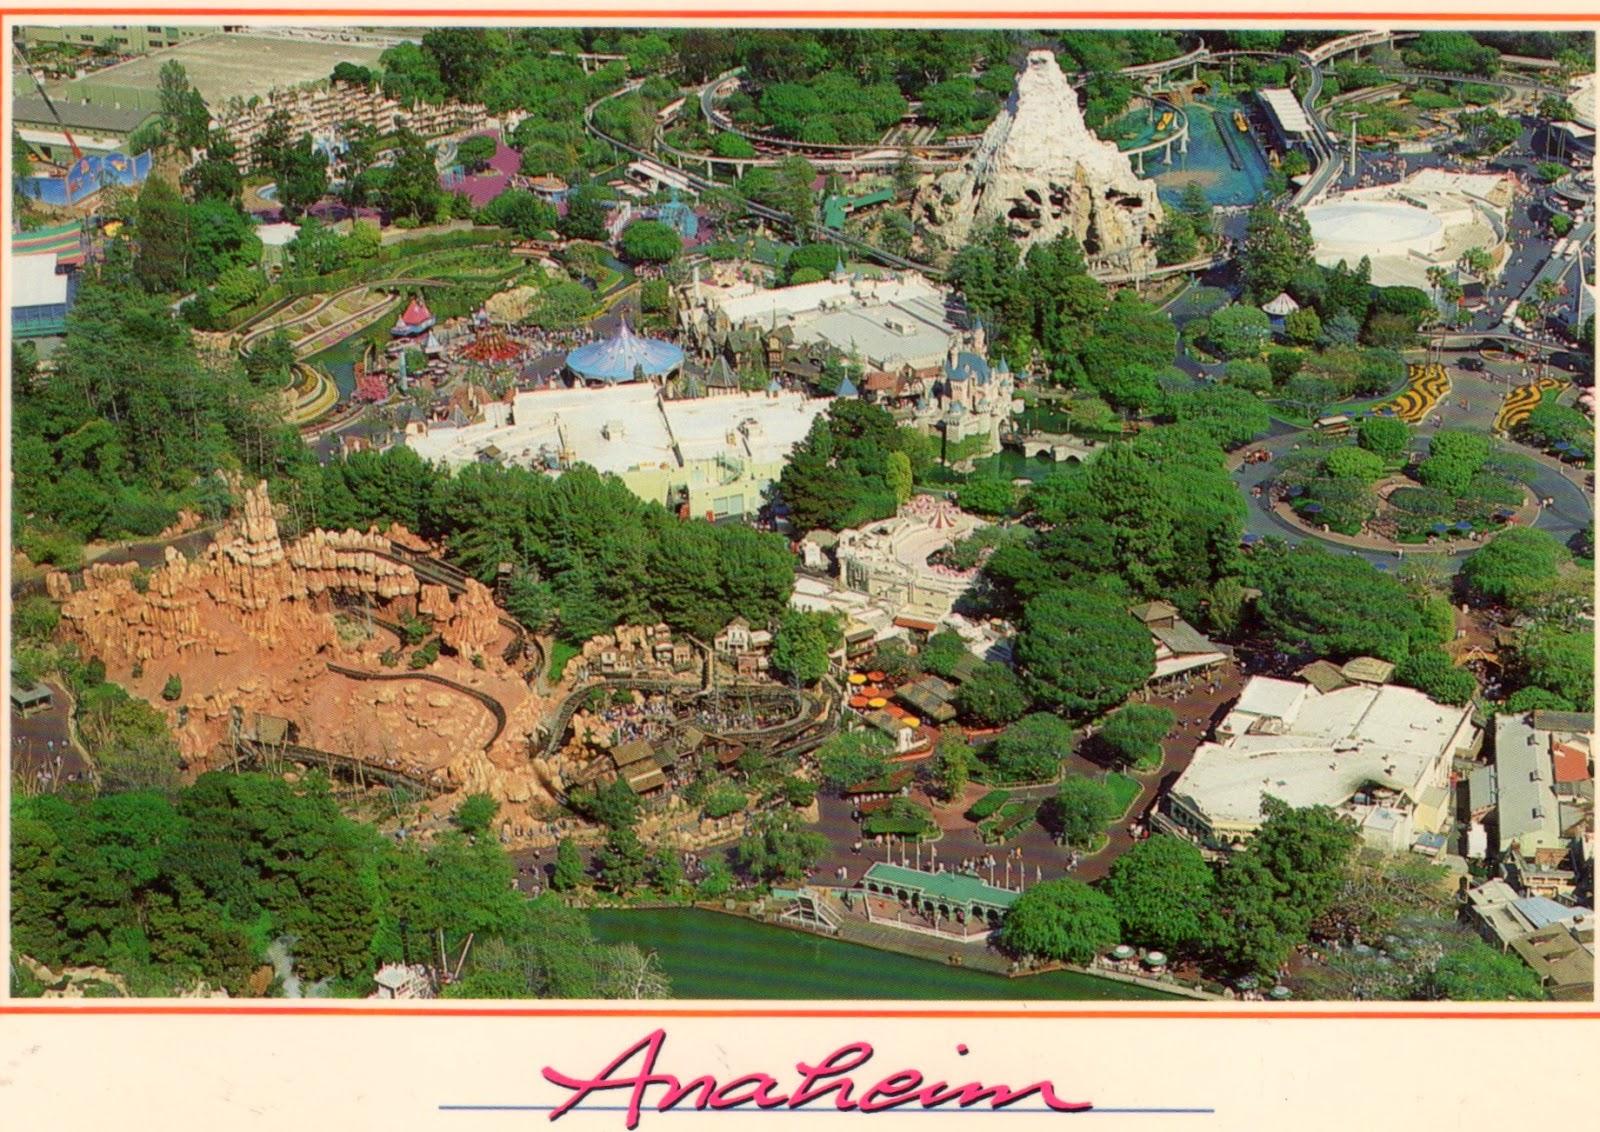 vista aérea da Disneyland